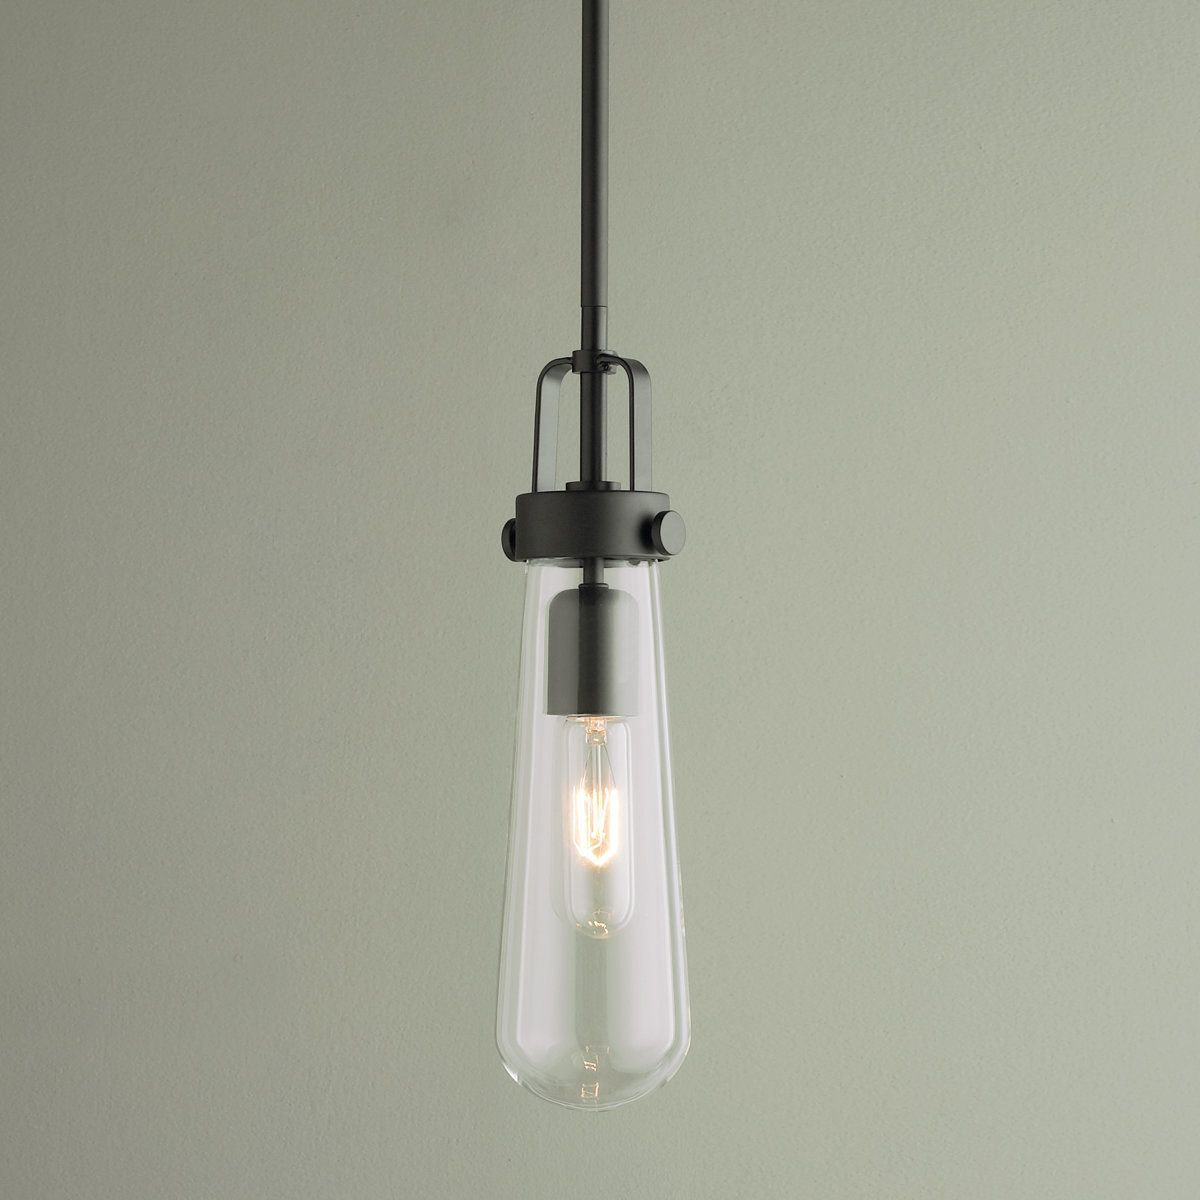 clear glass pendant lights. Clear Glass Vial Pendant Light Lights 0